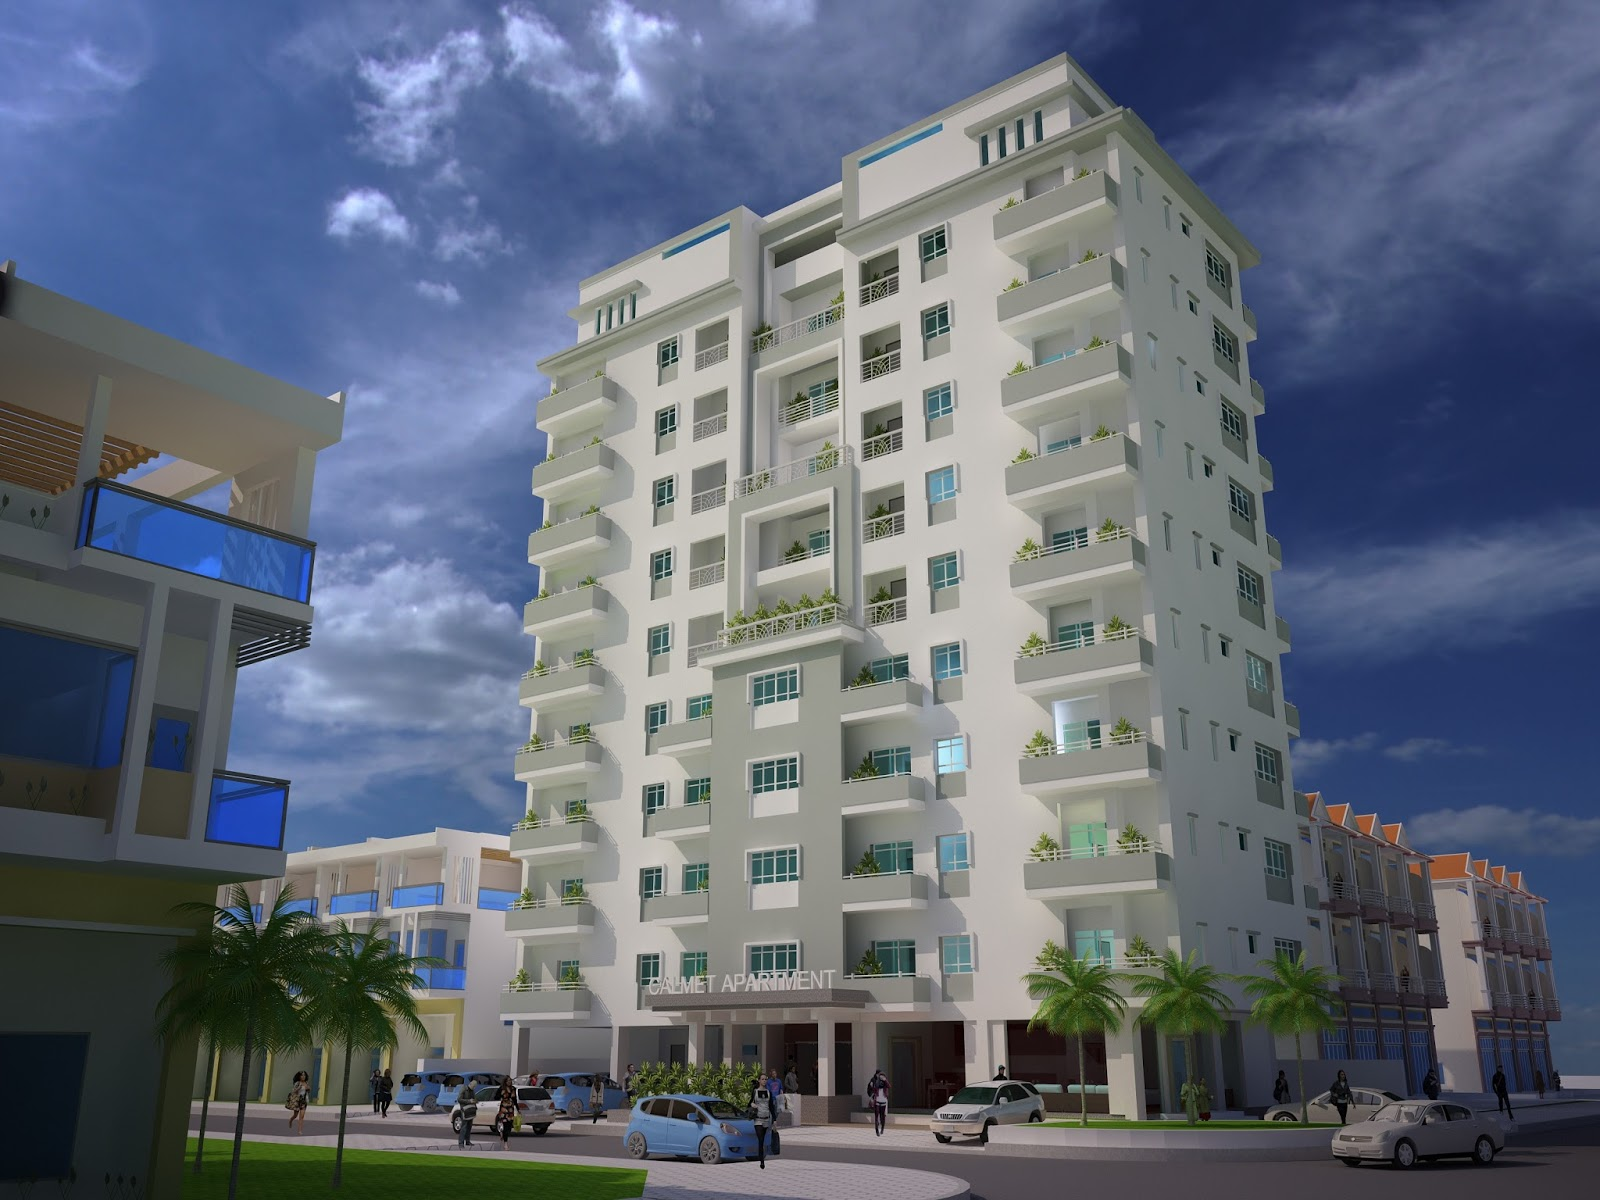 Architect Apartment Exterior design Sketchup model ref 003 | SaM ...